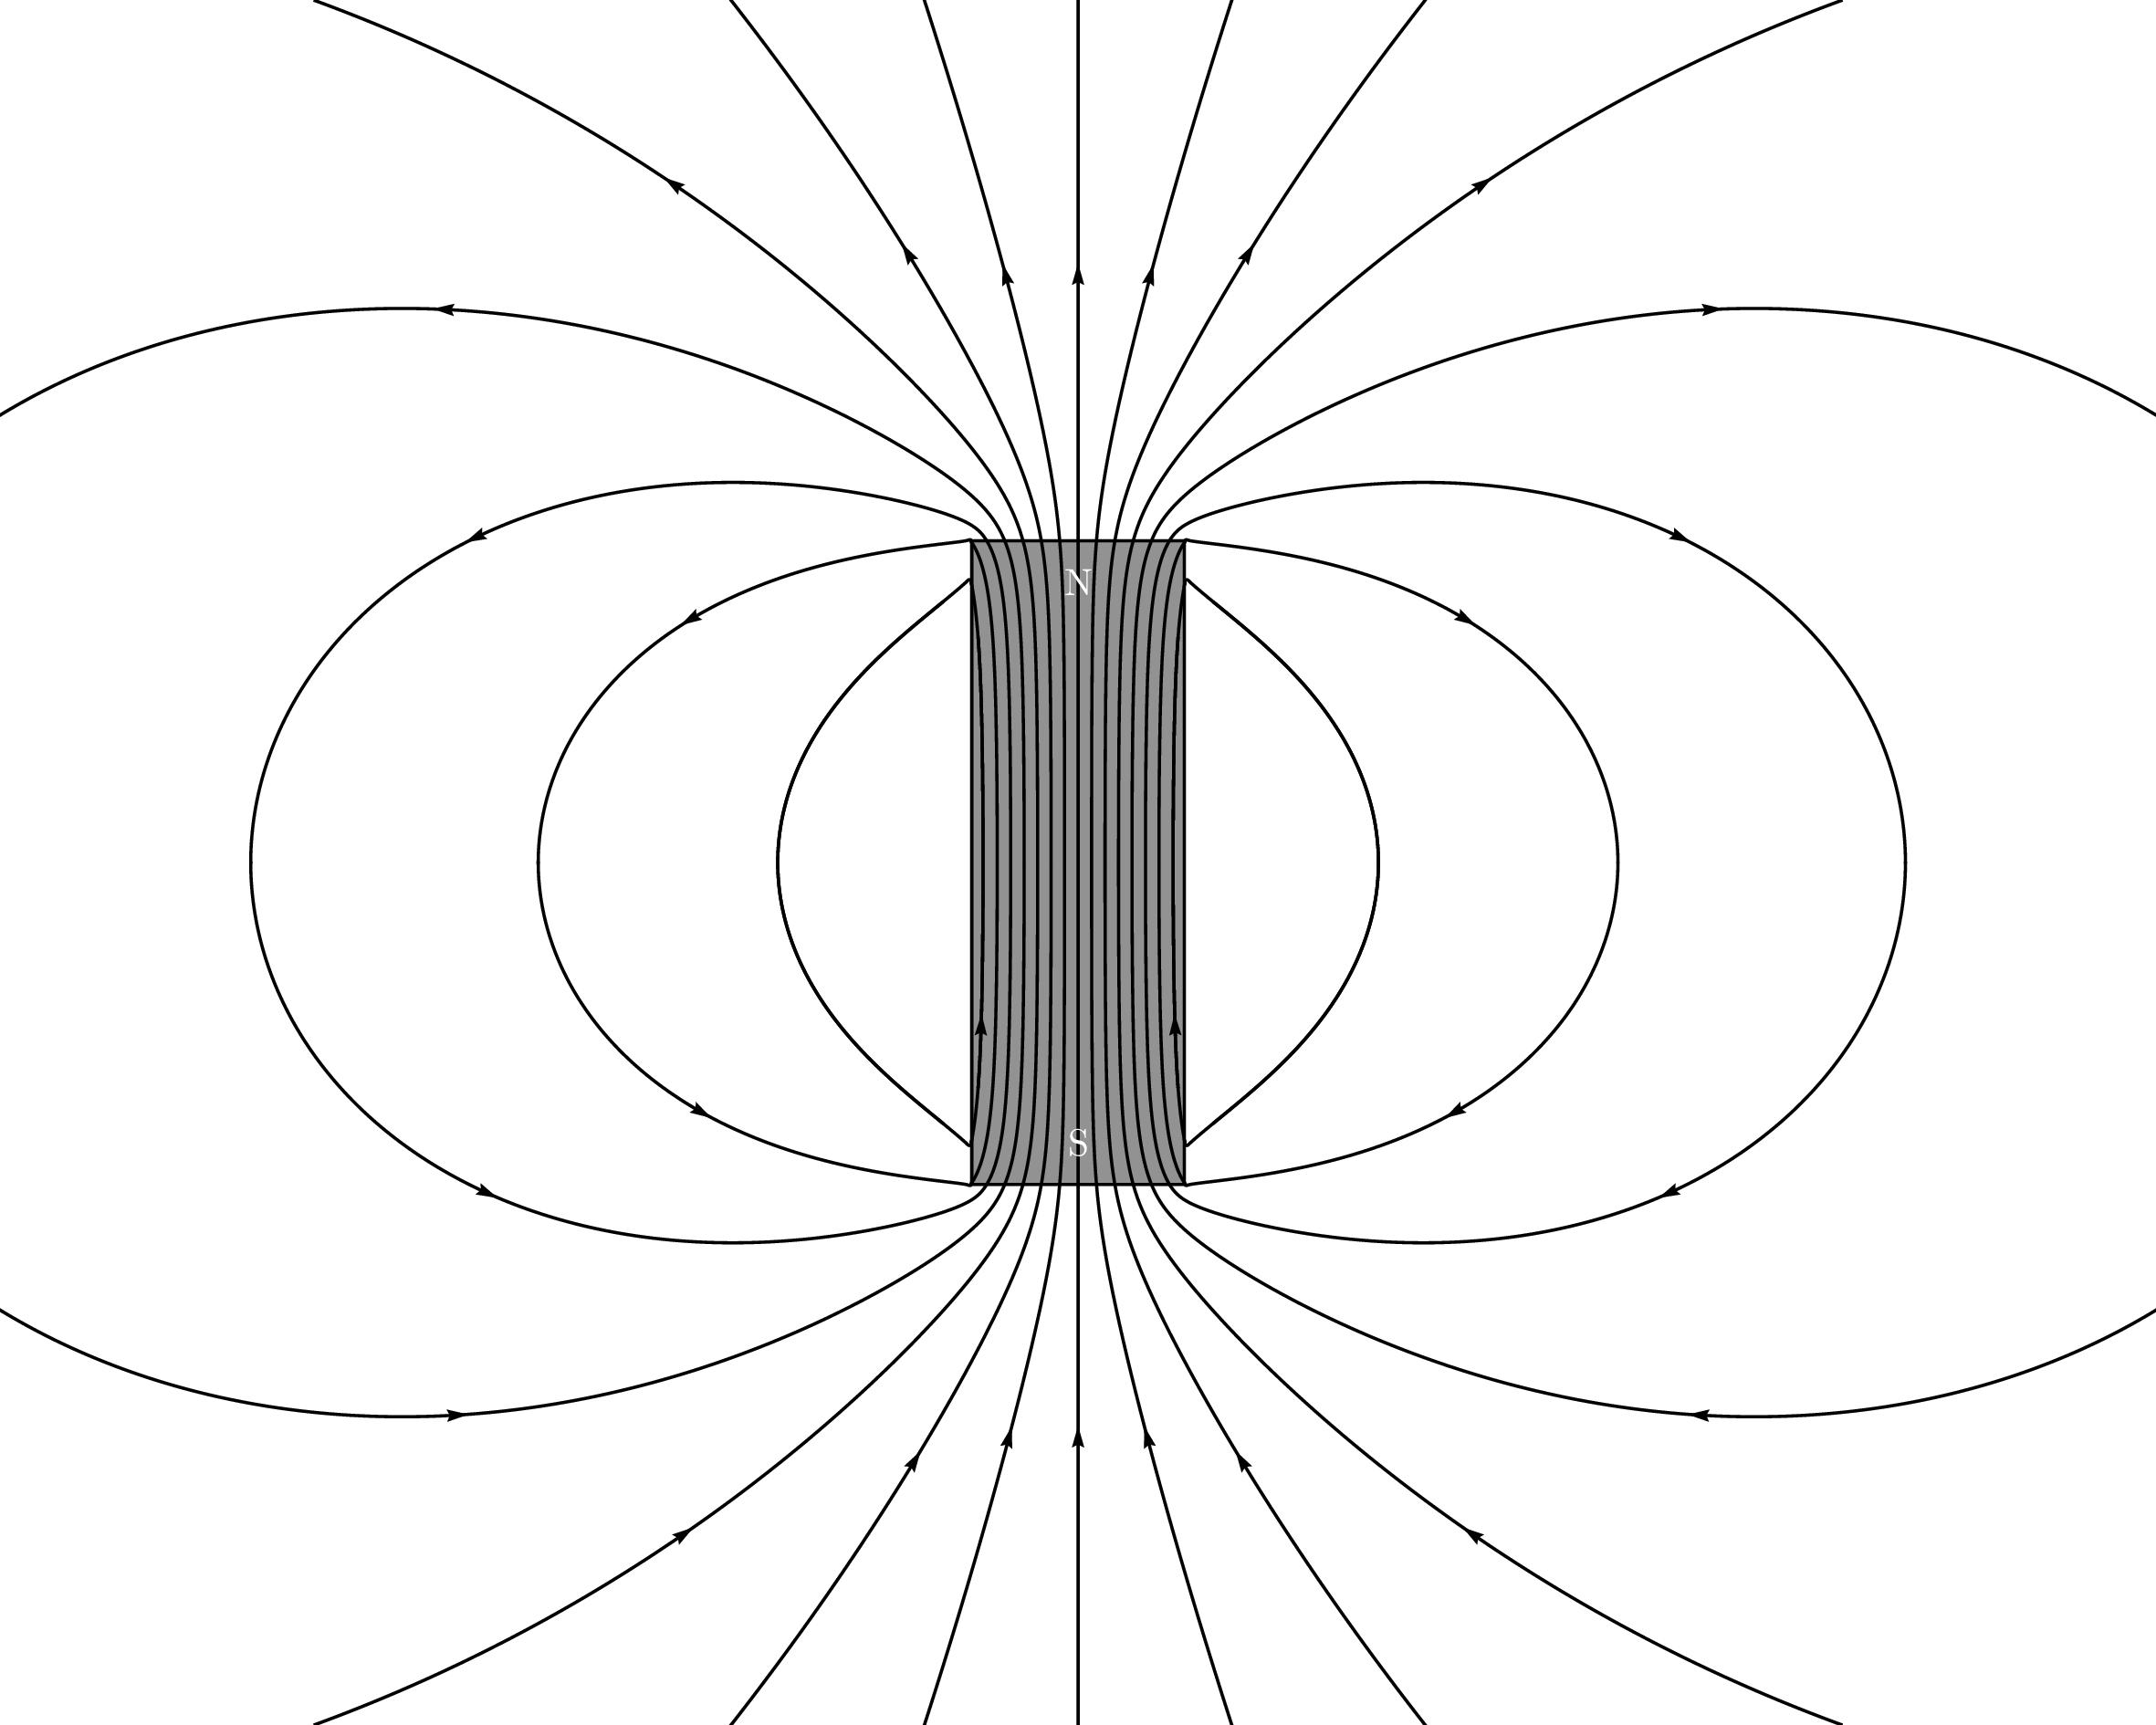 Pstricks Magnetic Field Lines Of A Bar Magnet